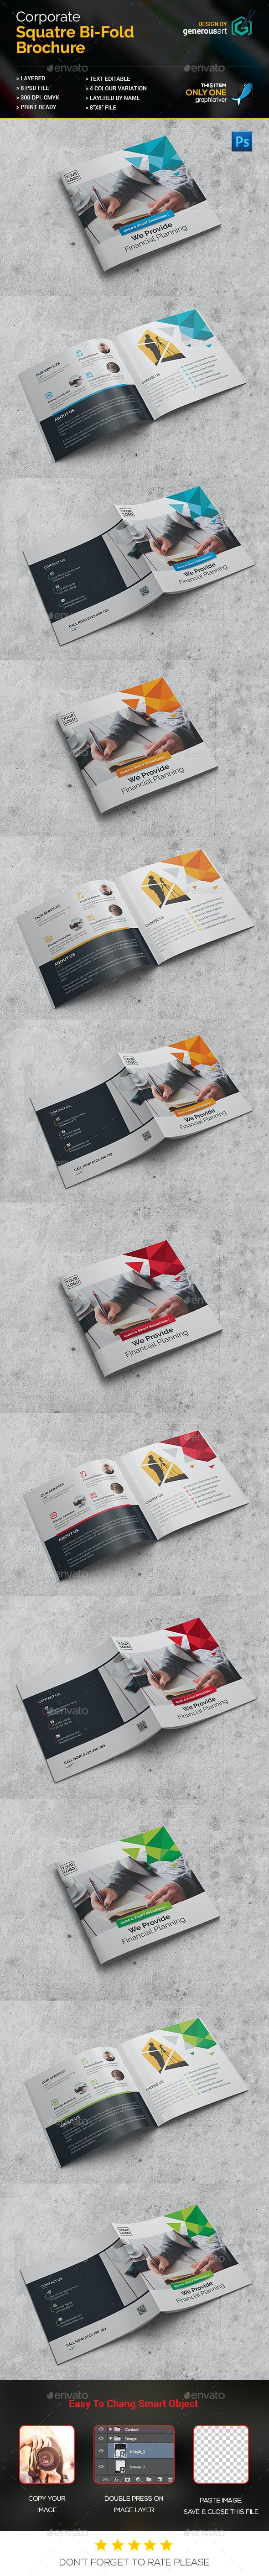 Pro_Square Bi-Fold Brochure - Corporate Brochures